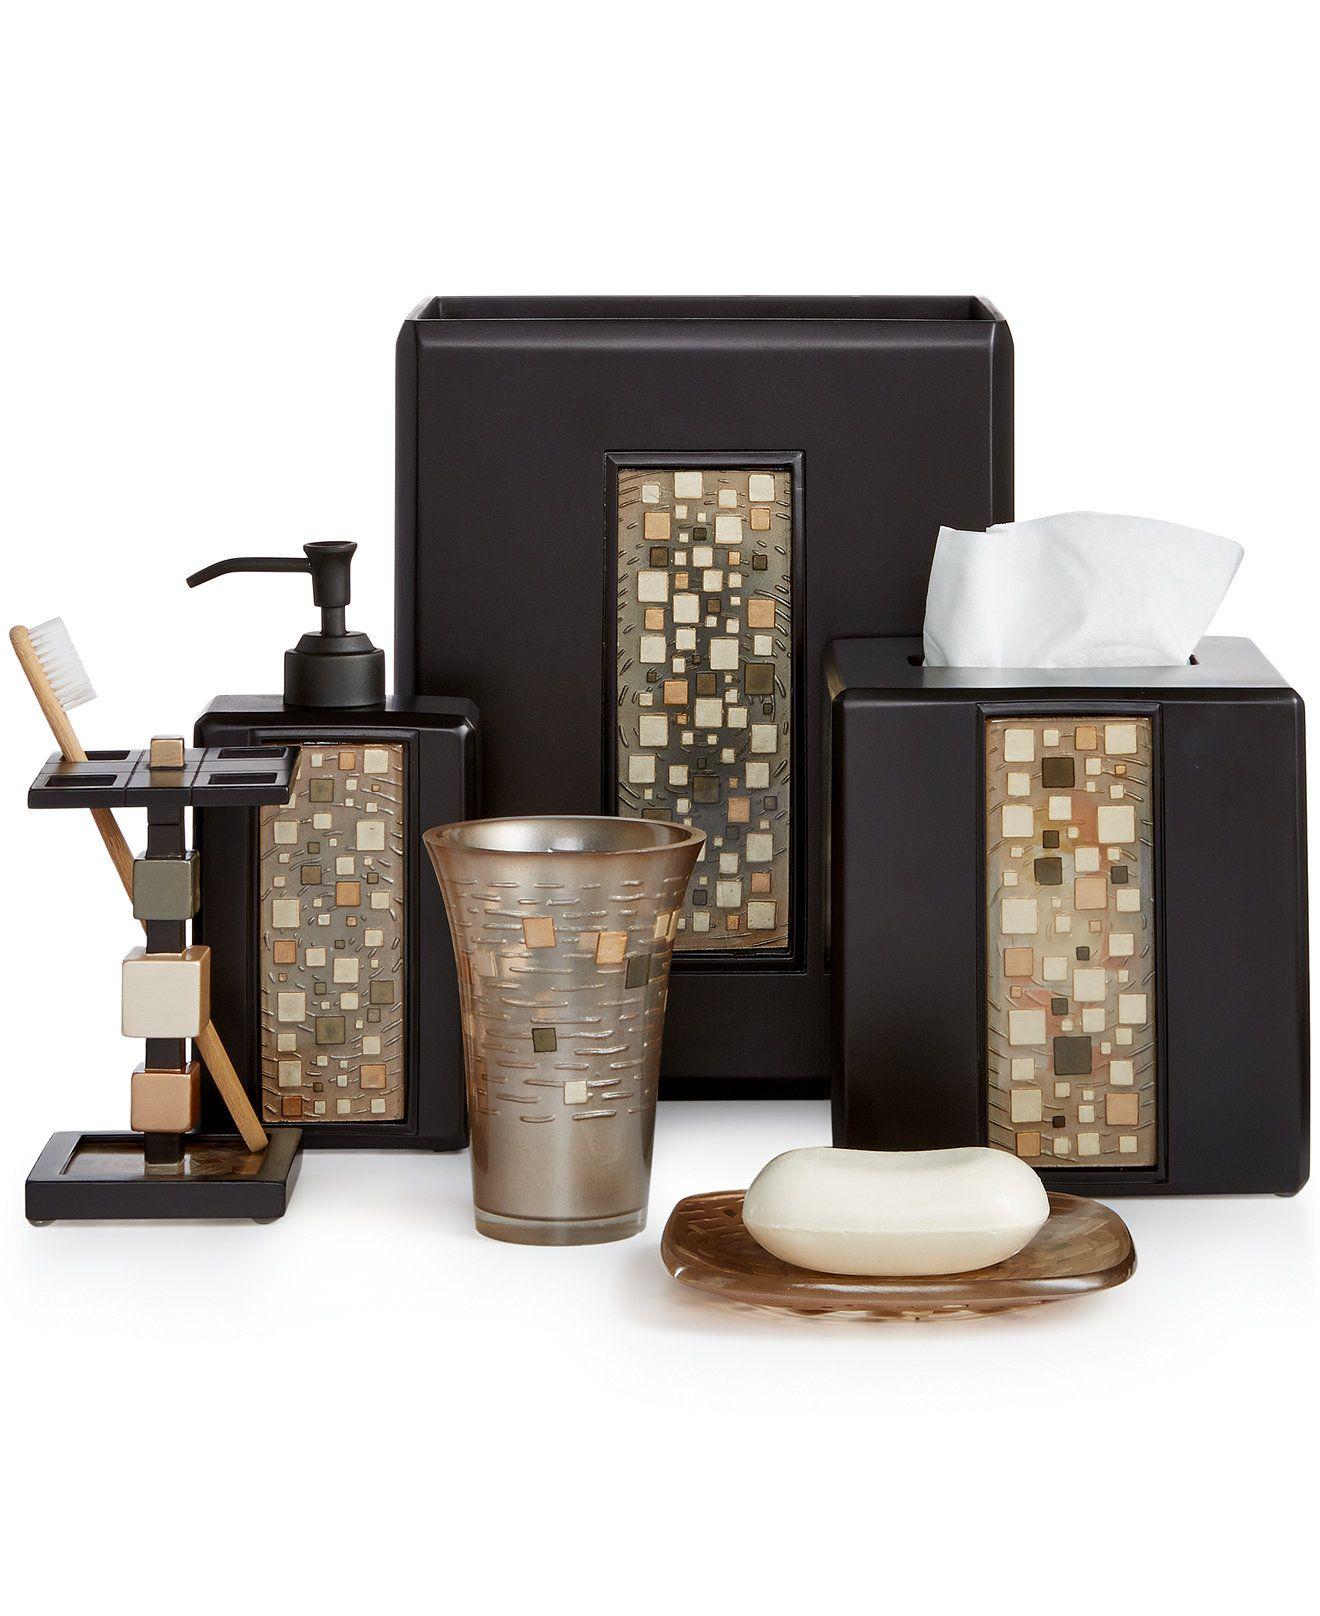 Bath Mosaic Bath Accessories Home Decorations Pinterest Bath - Croscill bathroom sets